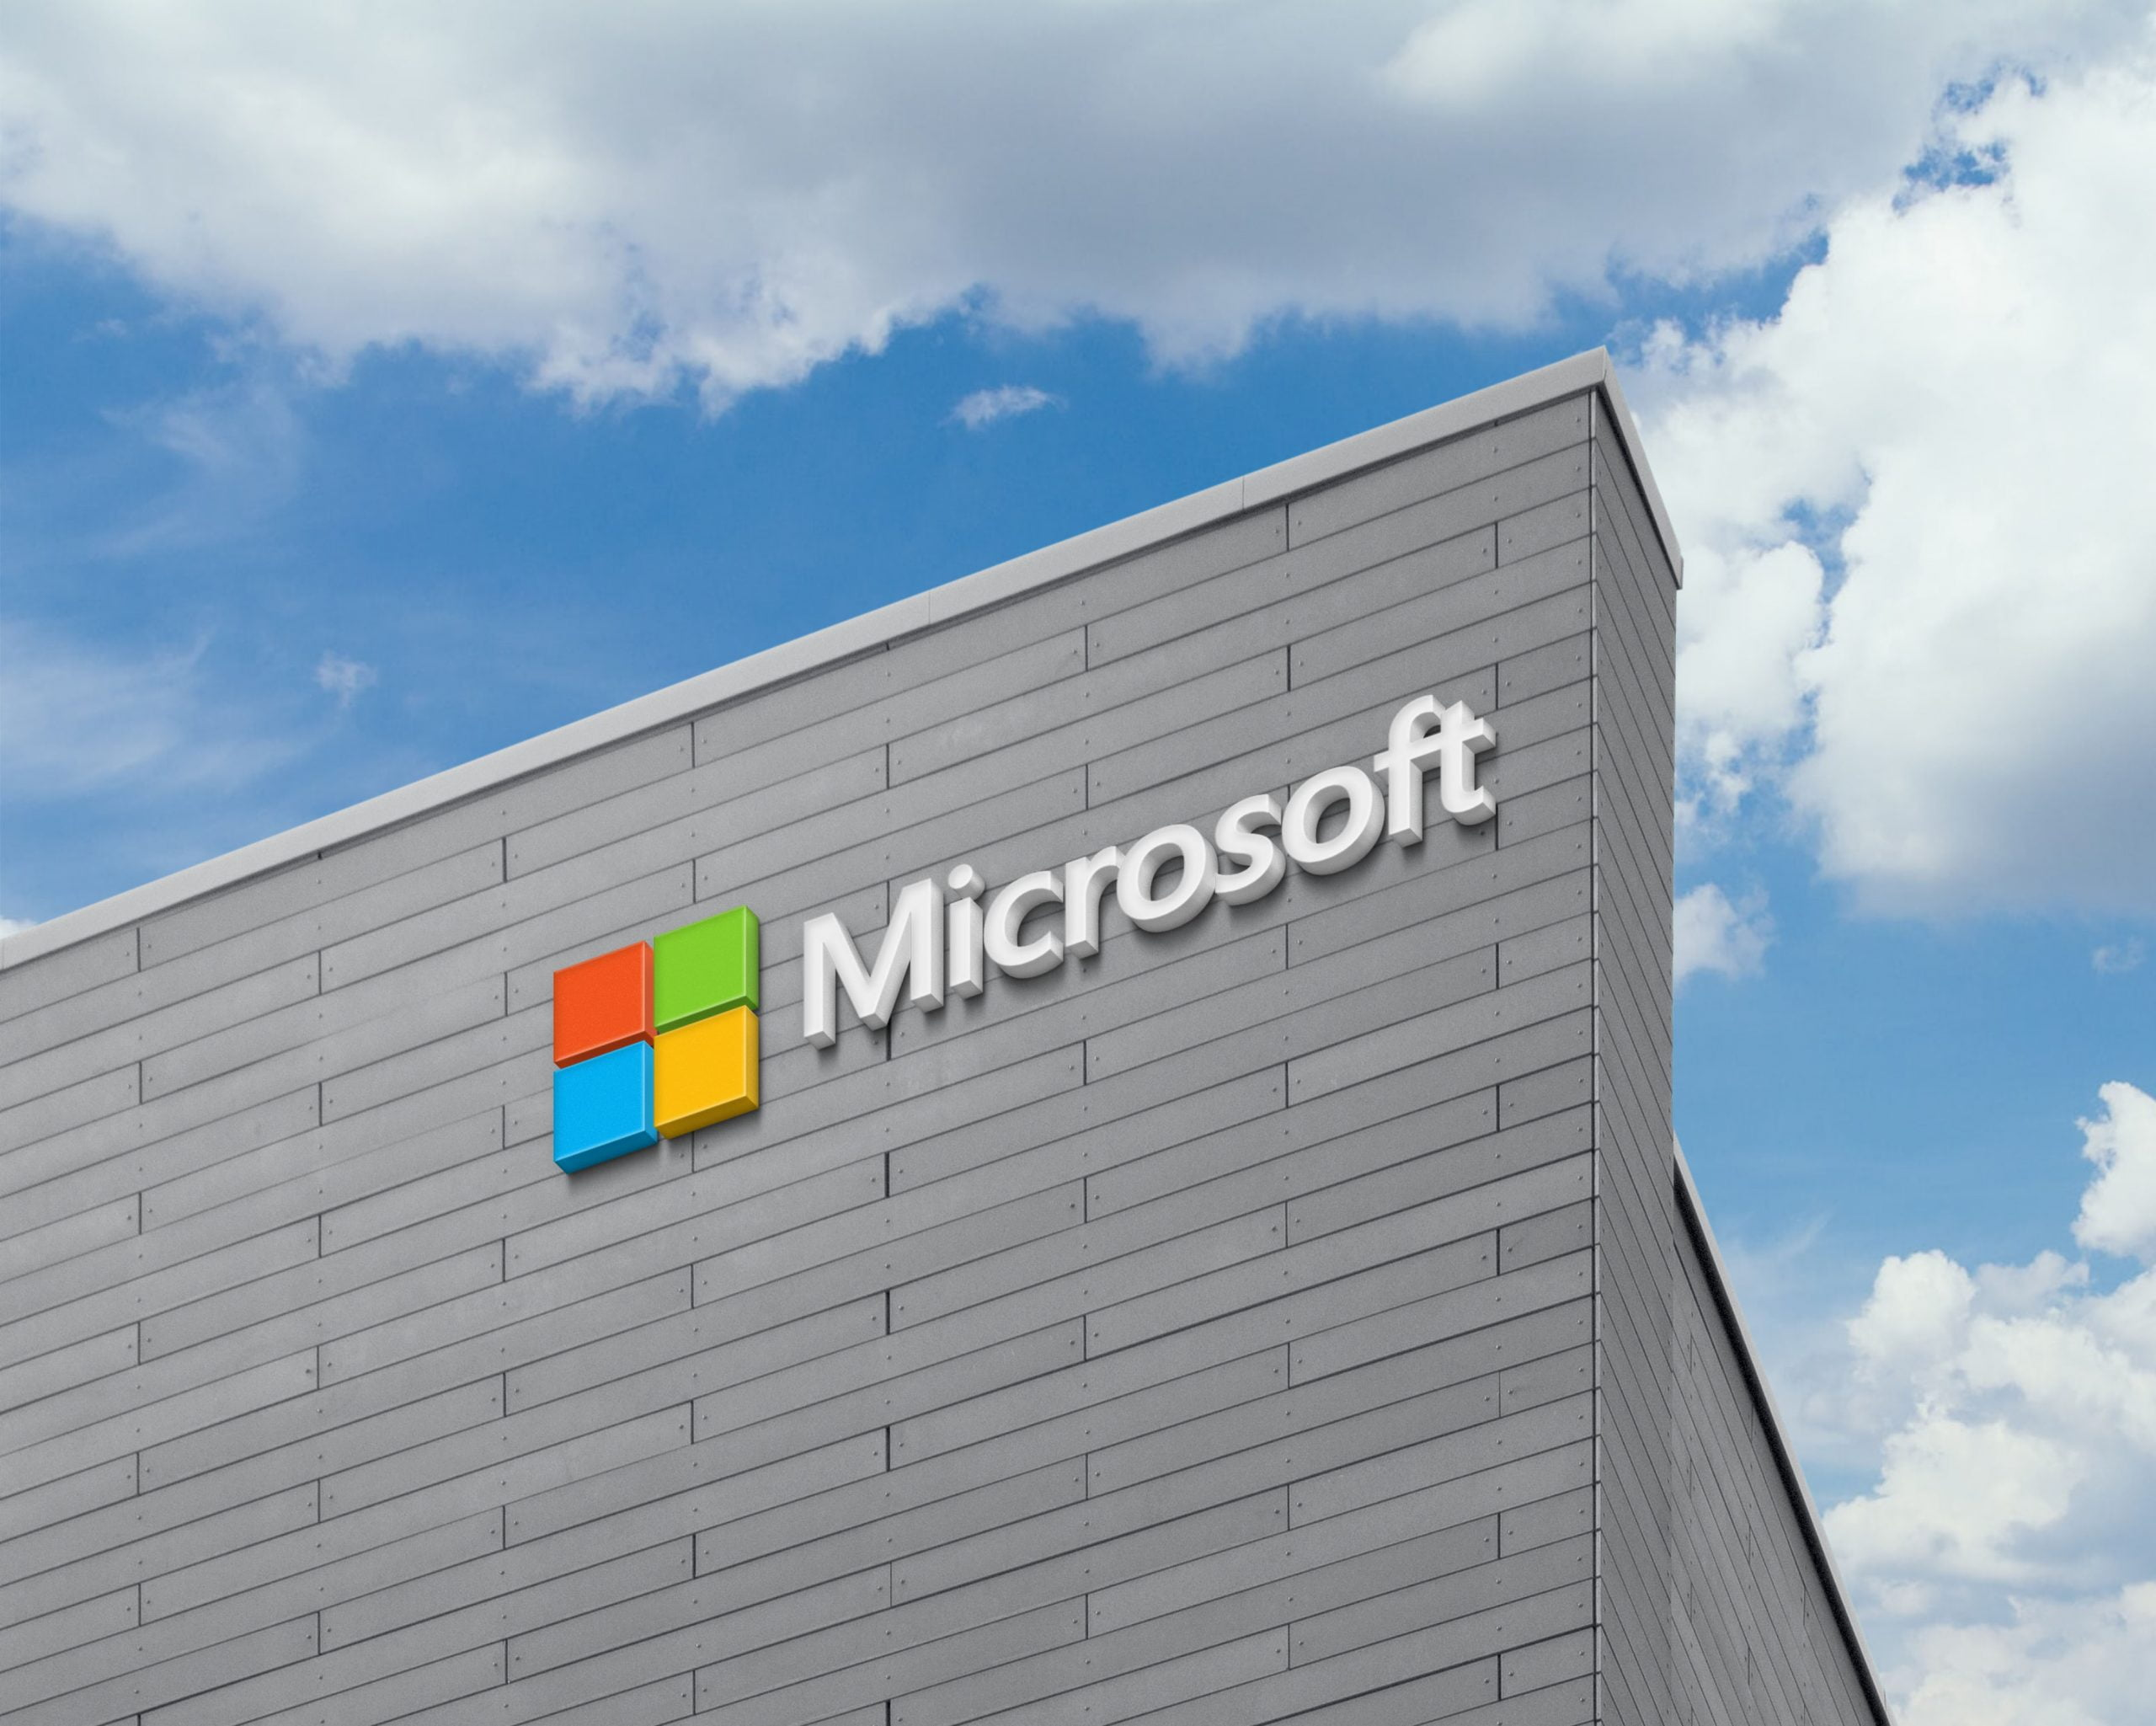 Microsoft Logo 3D Logo Sign on Building Facade Wall Mock-Up